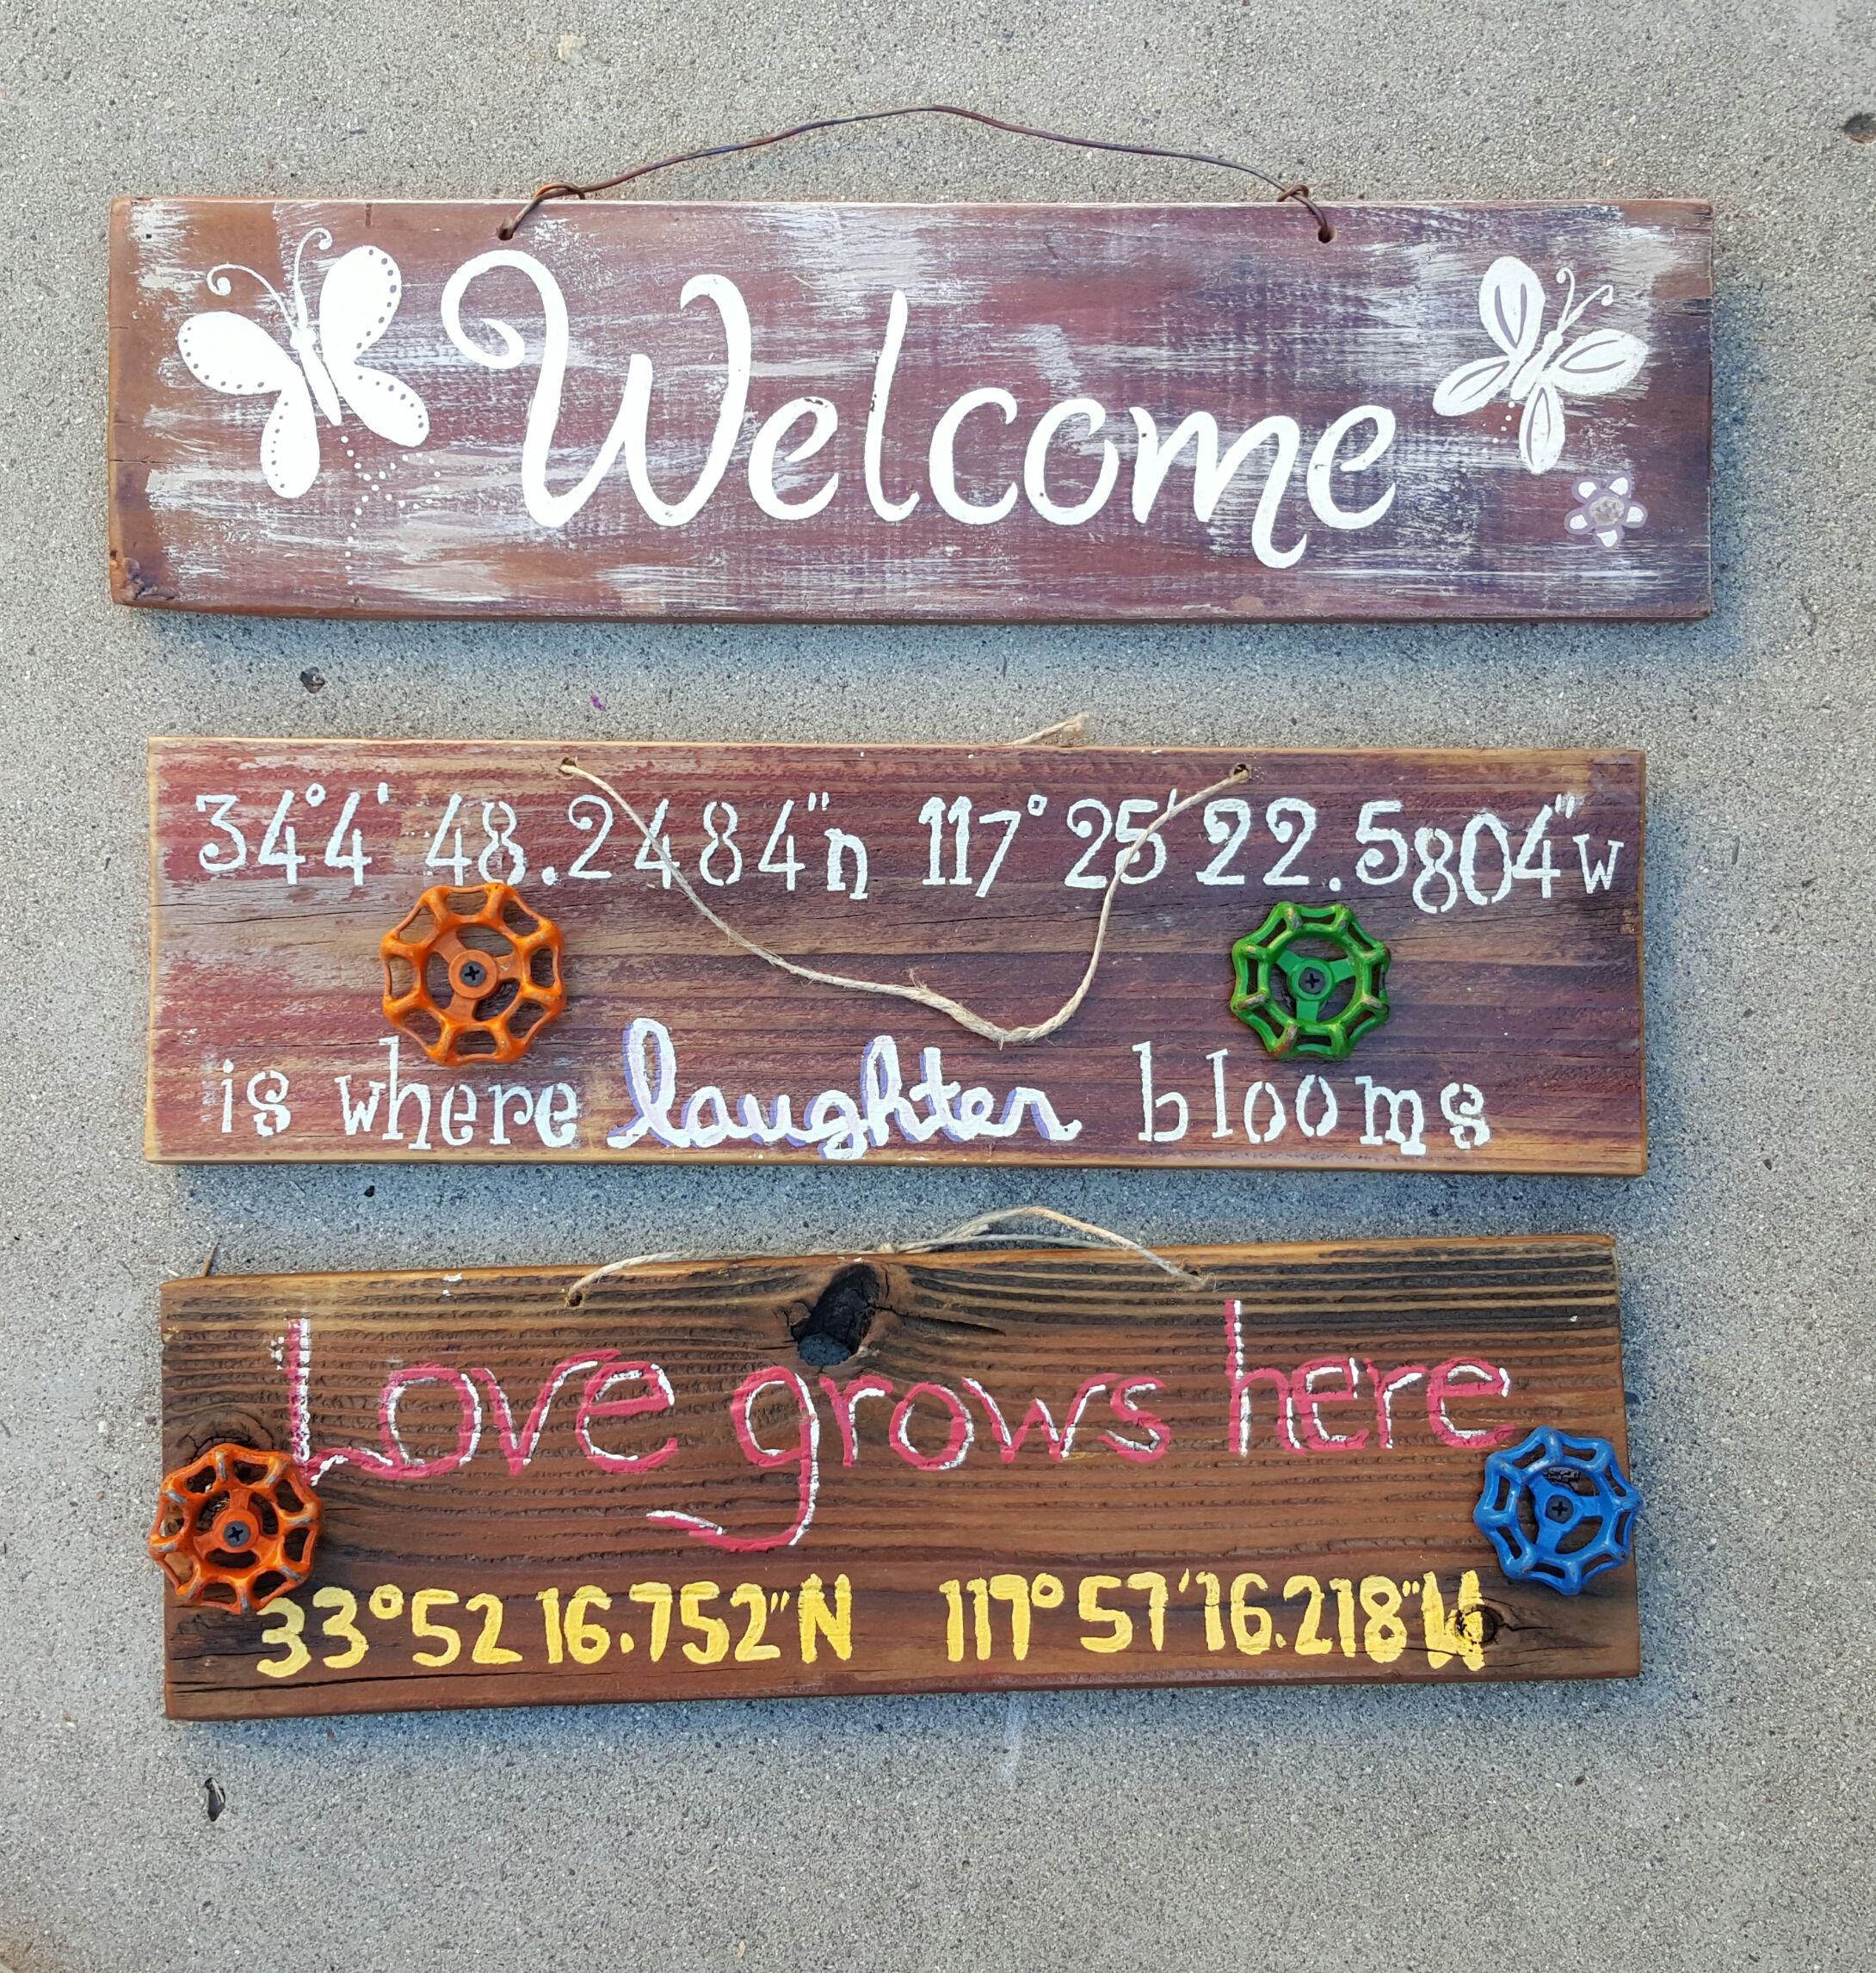 Park Art|My WordPress Blog_Dyer Lake Funeral Home In North Attleboro